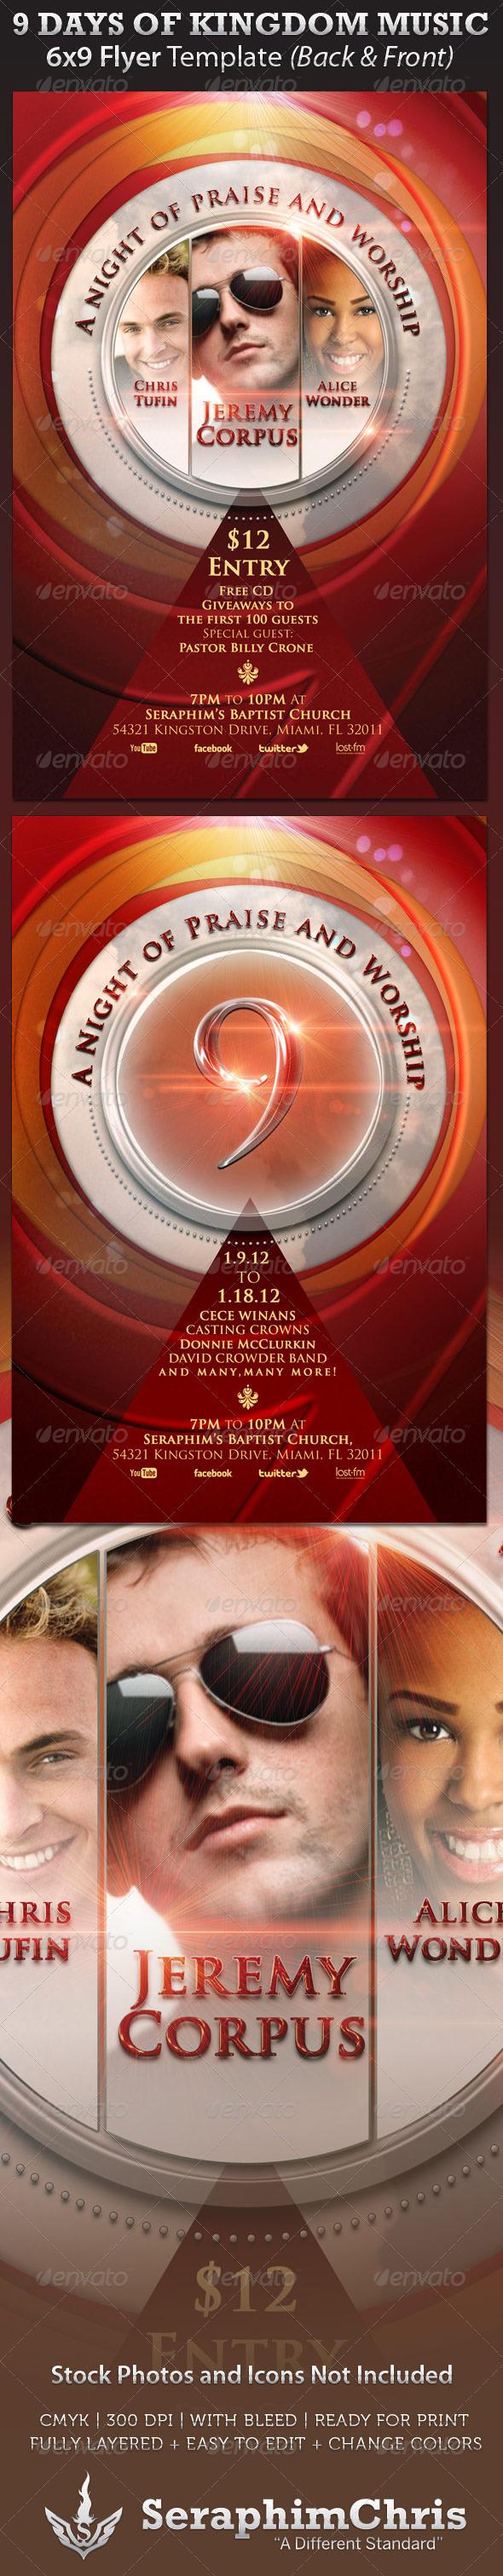 GraphicRiver 9 Days of Kingdom Music Flyer 759248